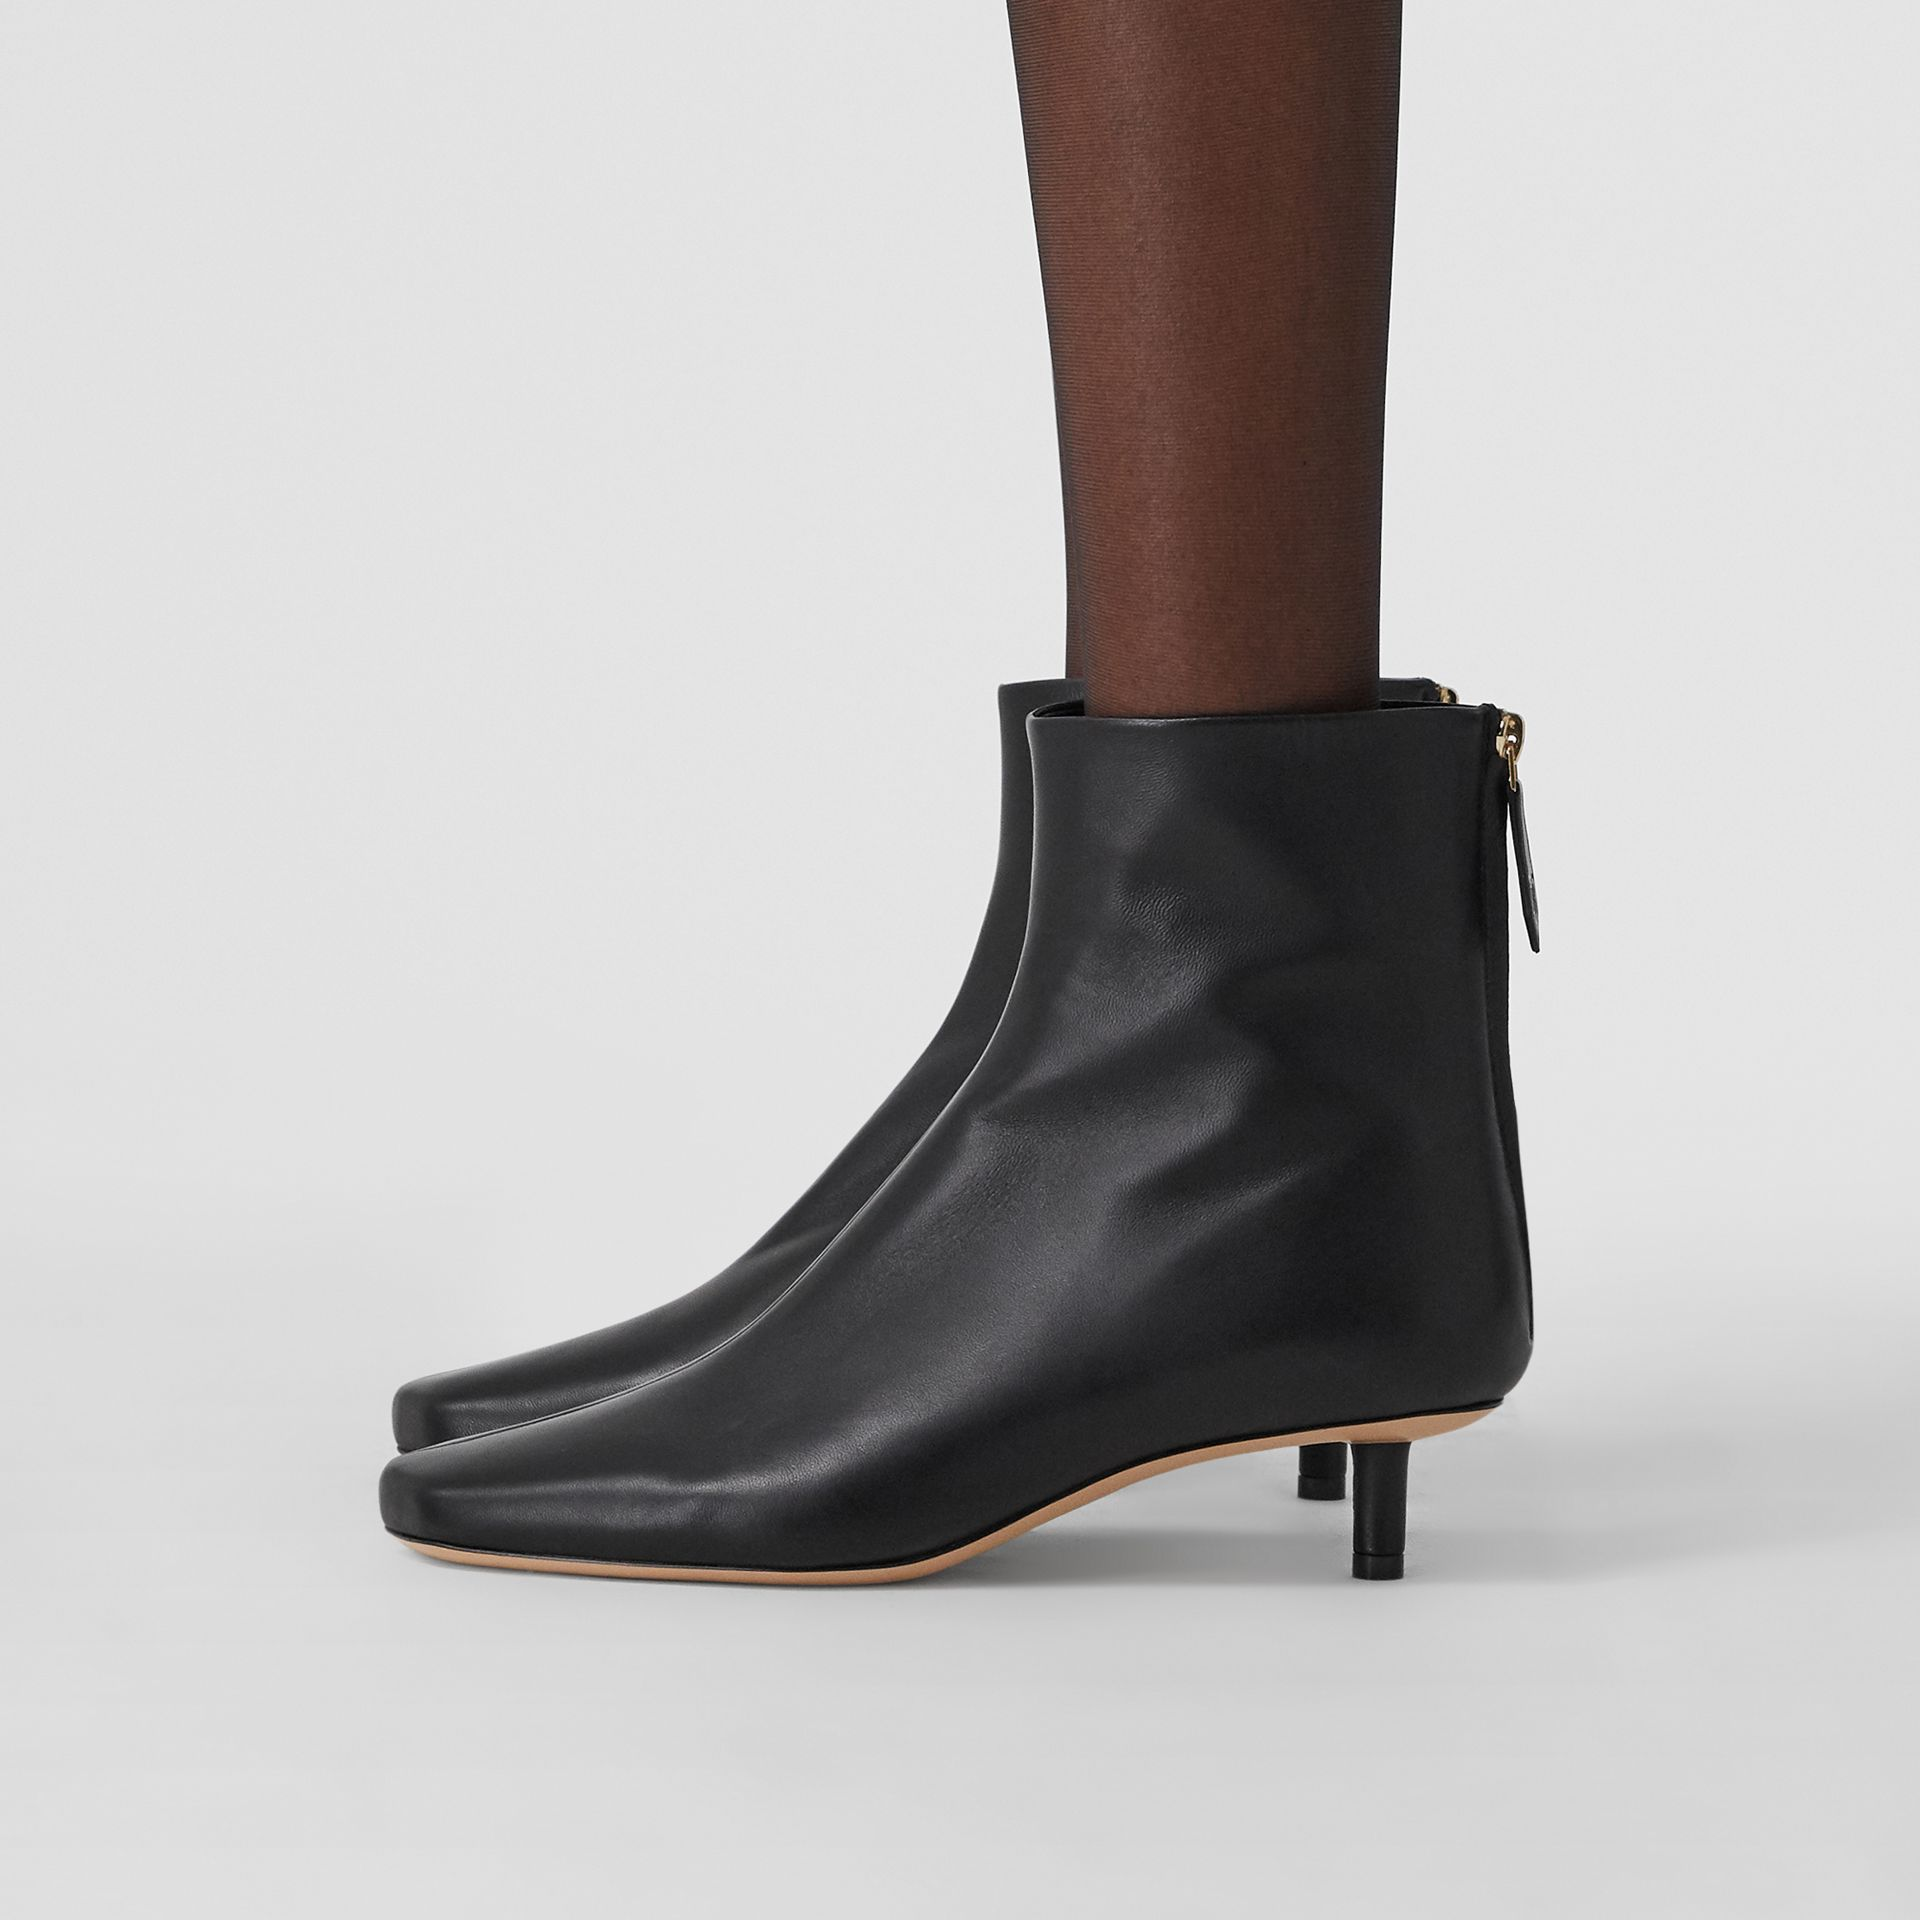 Lambskin Sculptural Kitten-heel Ankle Boots in Black - Women | Burberry - gallery image 2